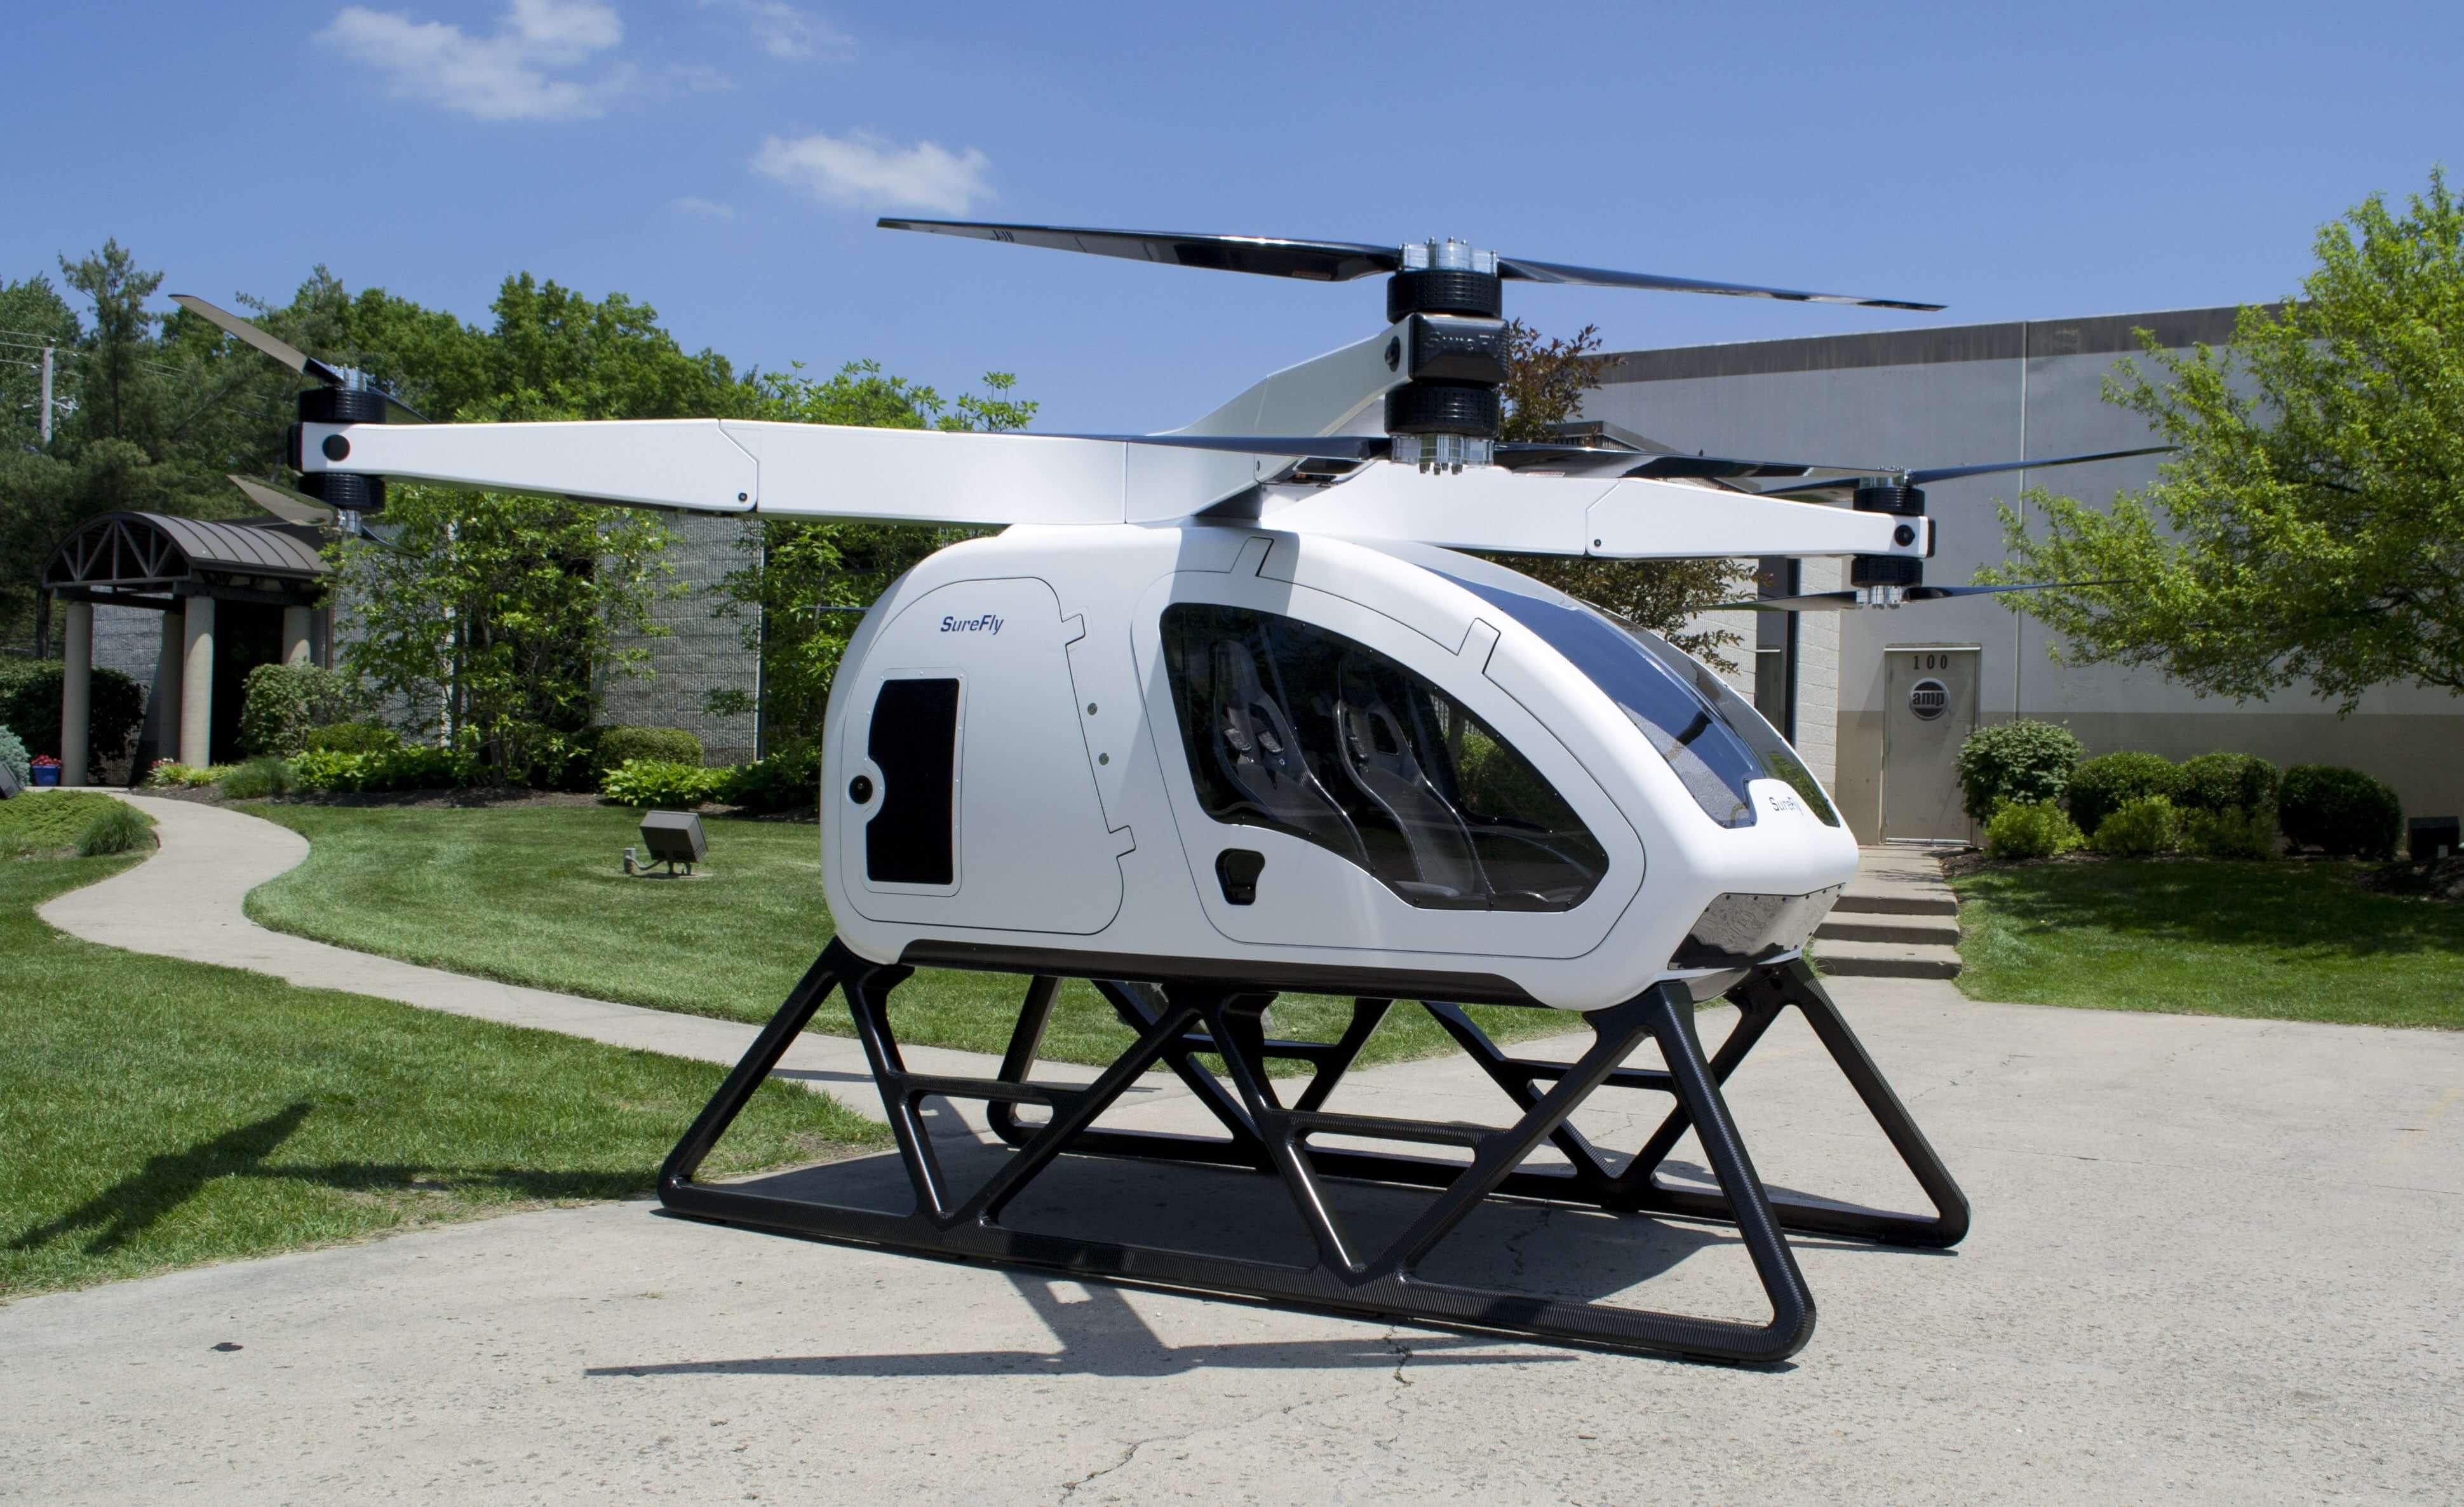 surefly workhorse drone